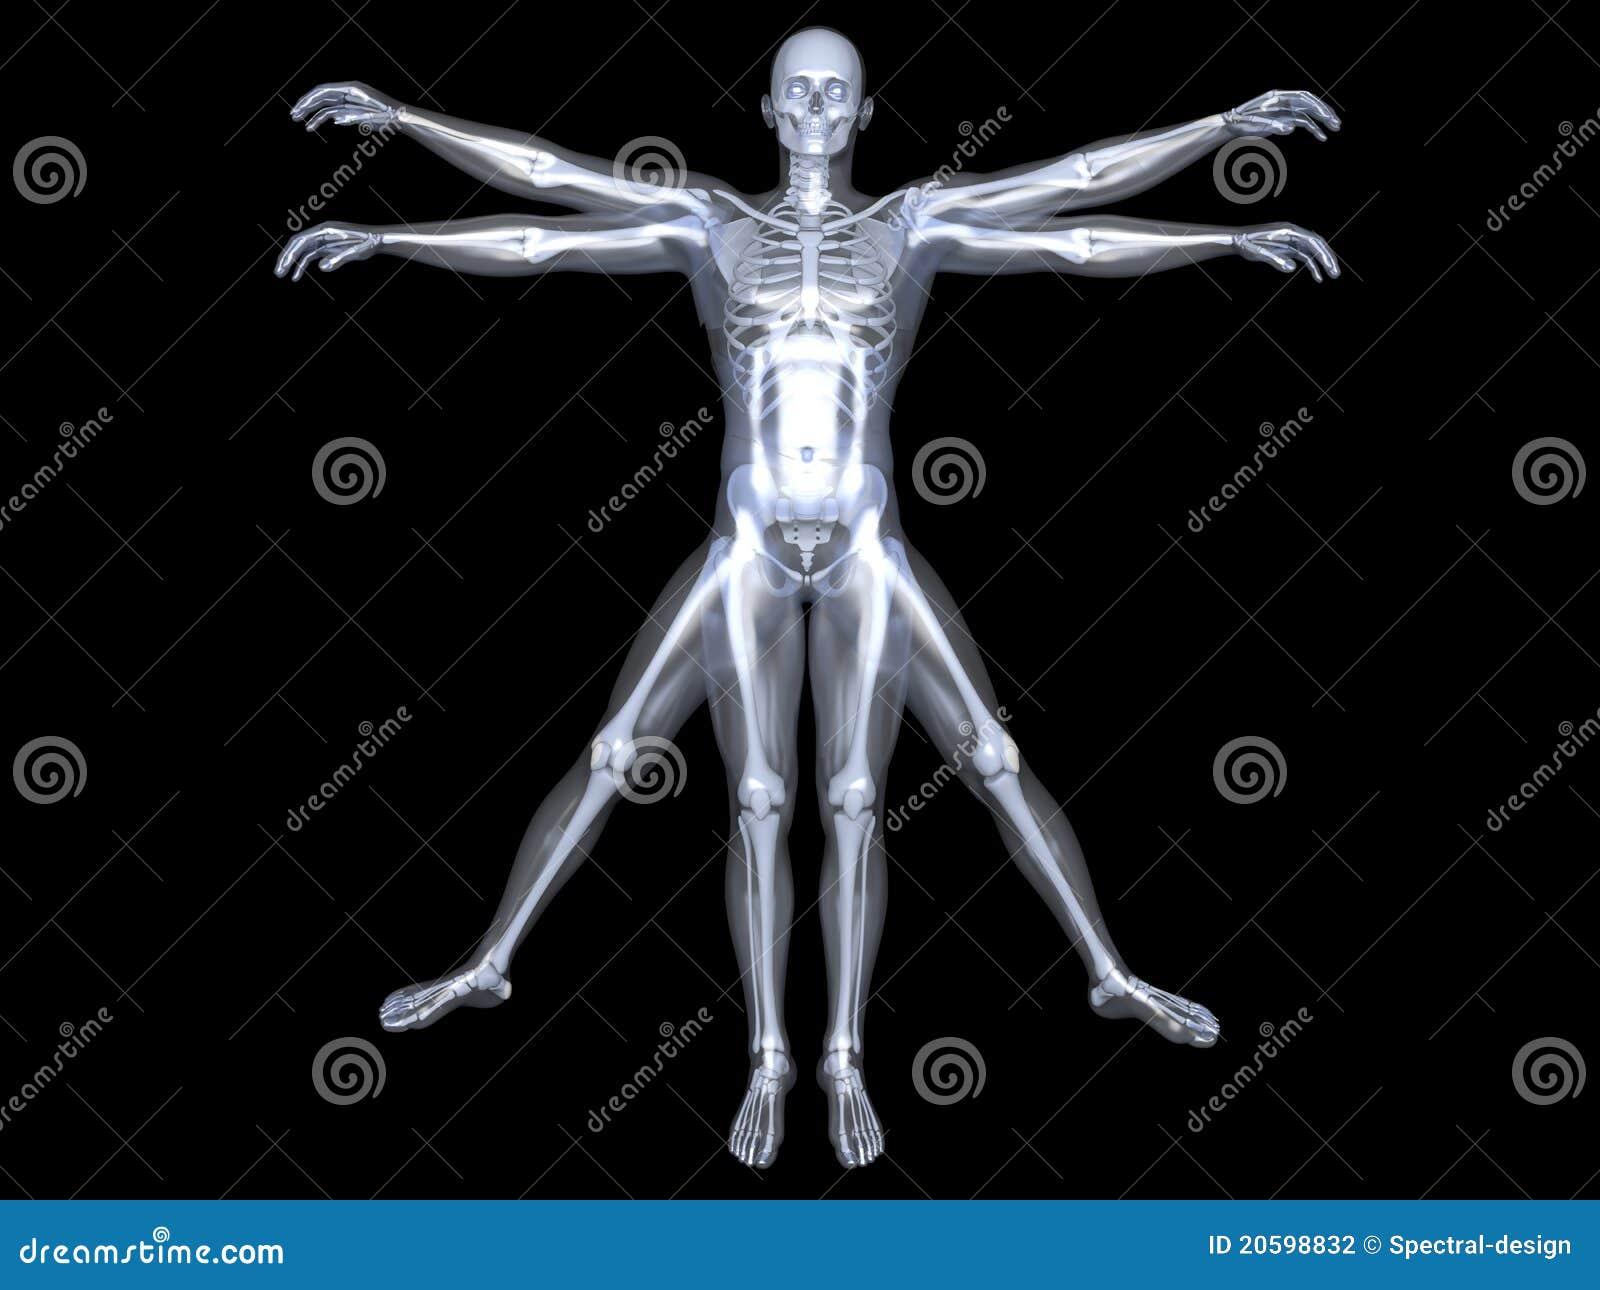 Human Form Stock Photography - Image: 20598832